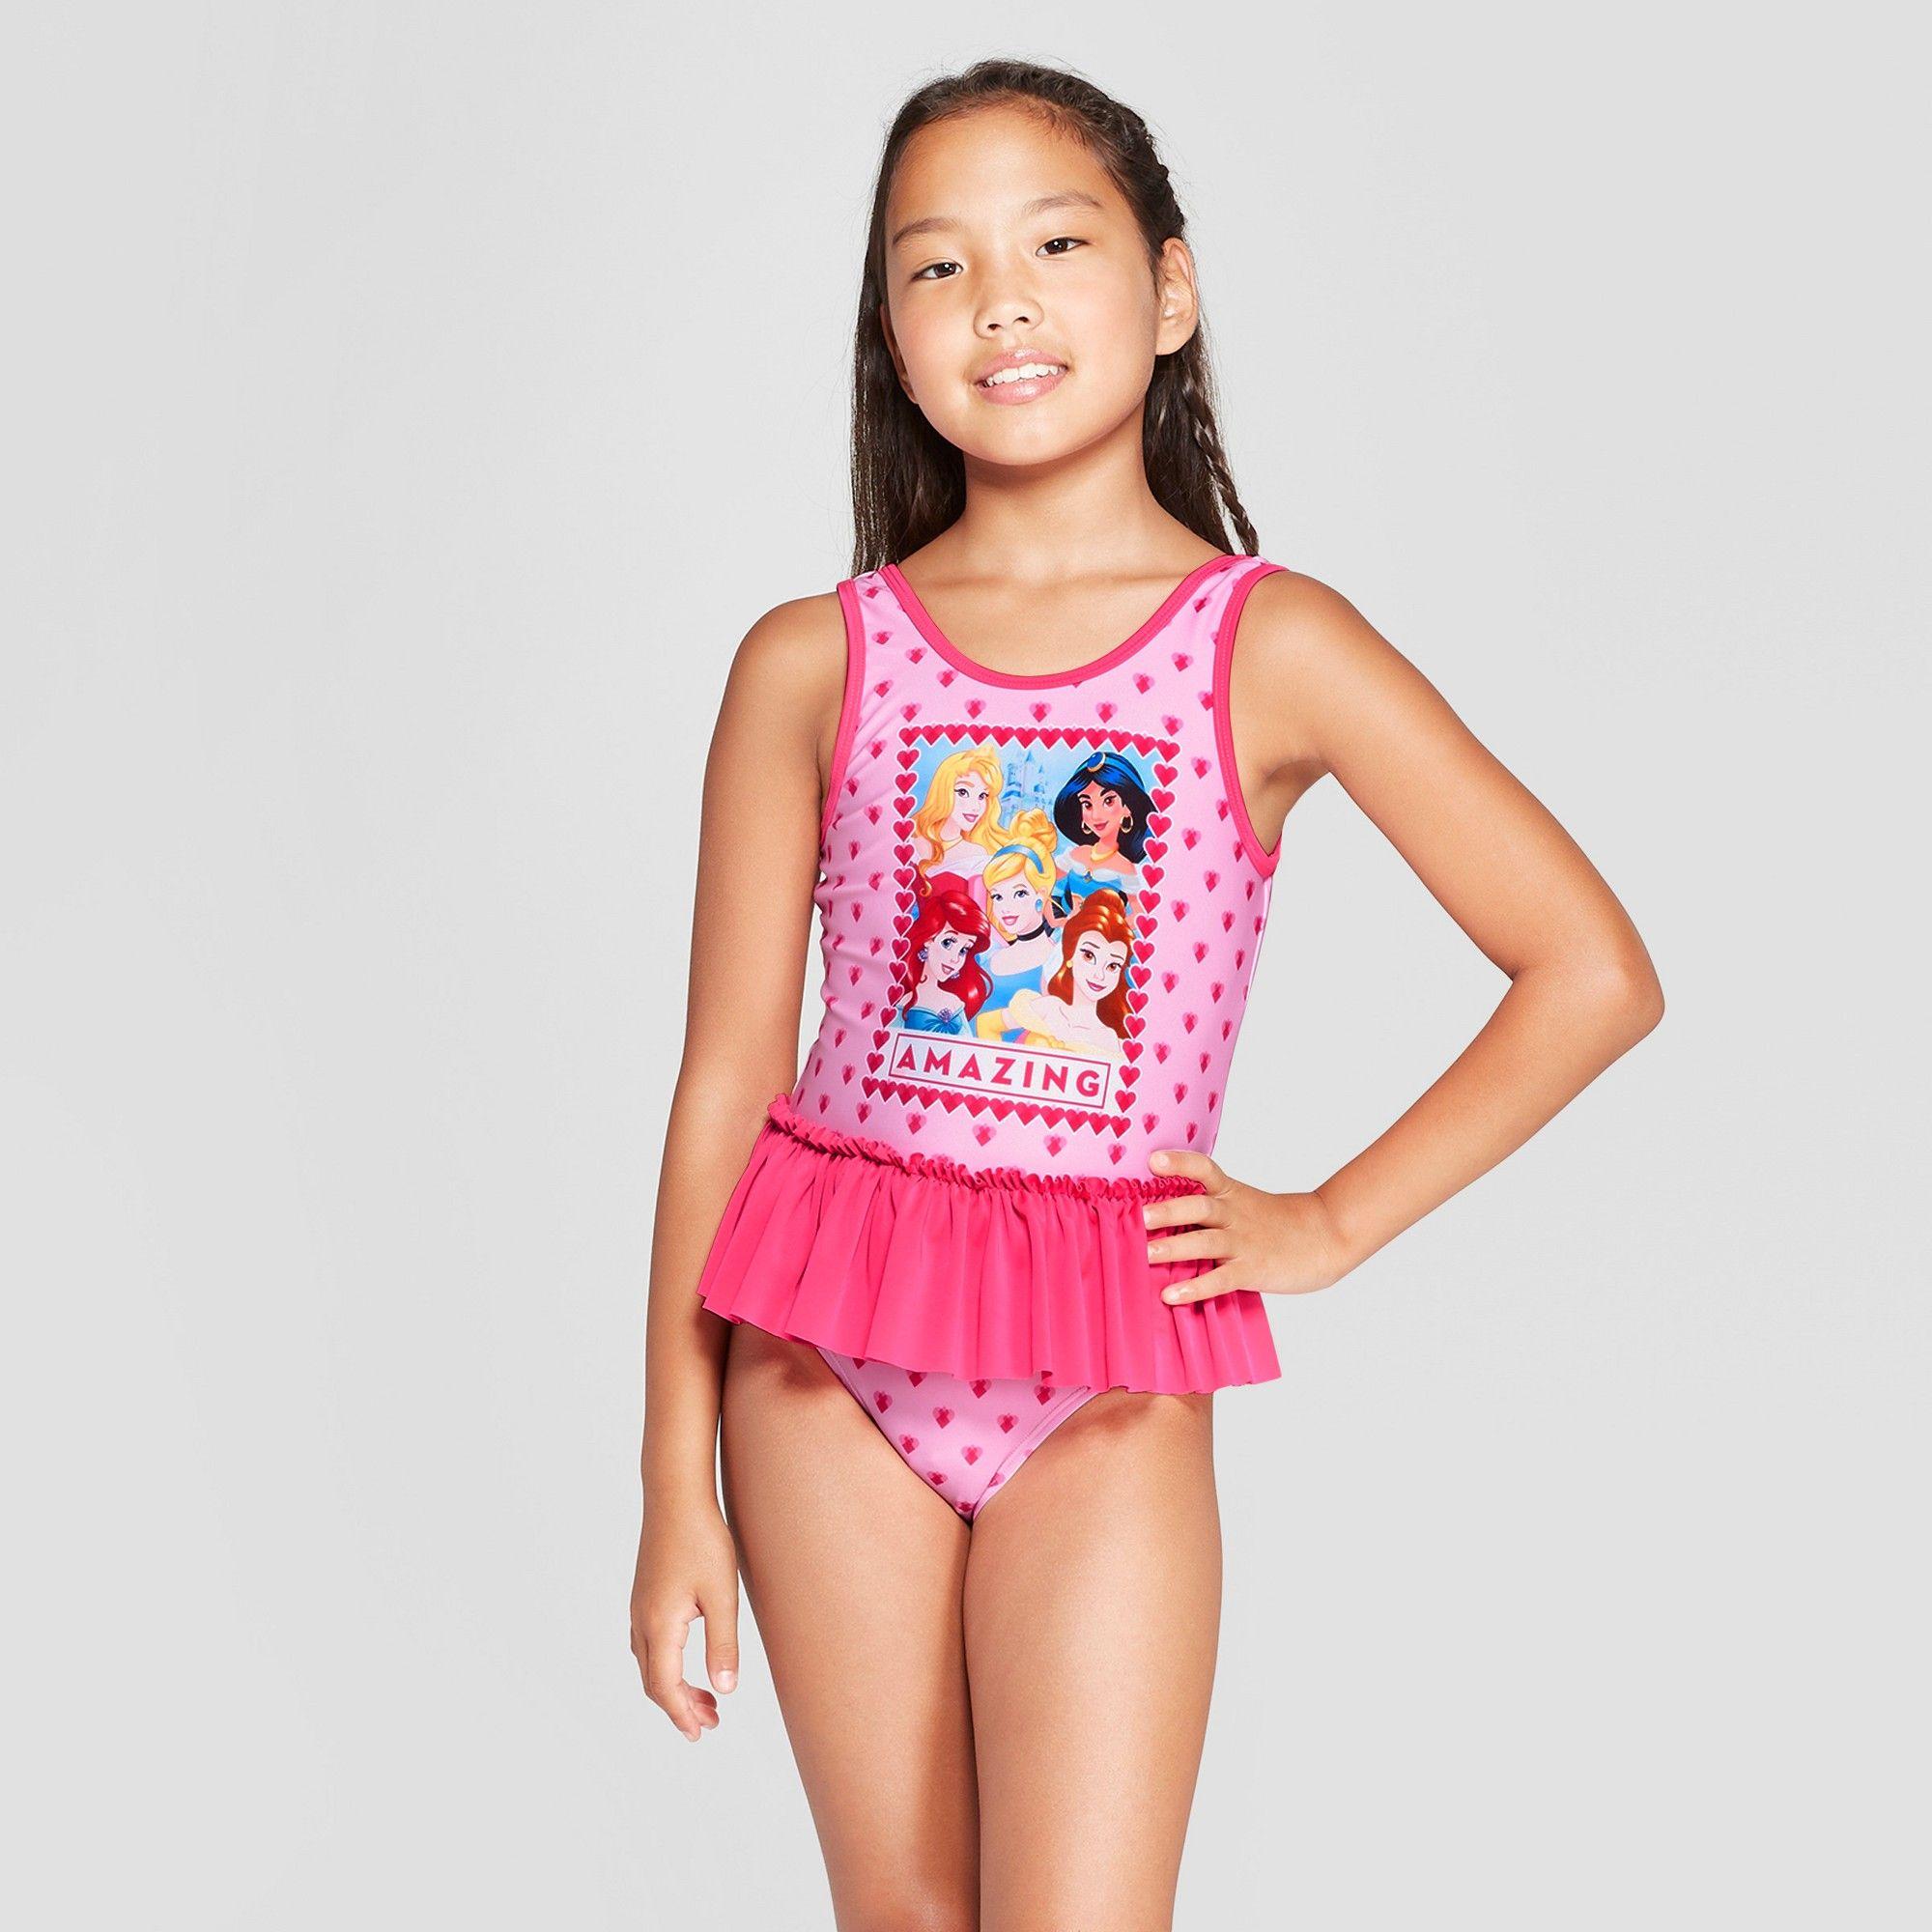 ca7fd04d52259 Girls' Disney Princess One Piece Swimsuit - Pink XS in 2019 | Frill ...